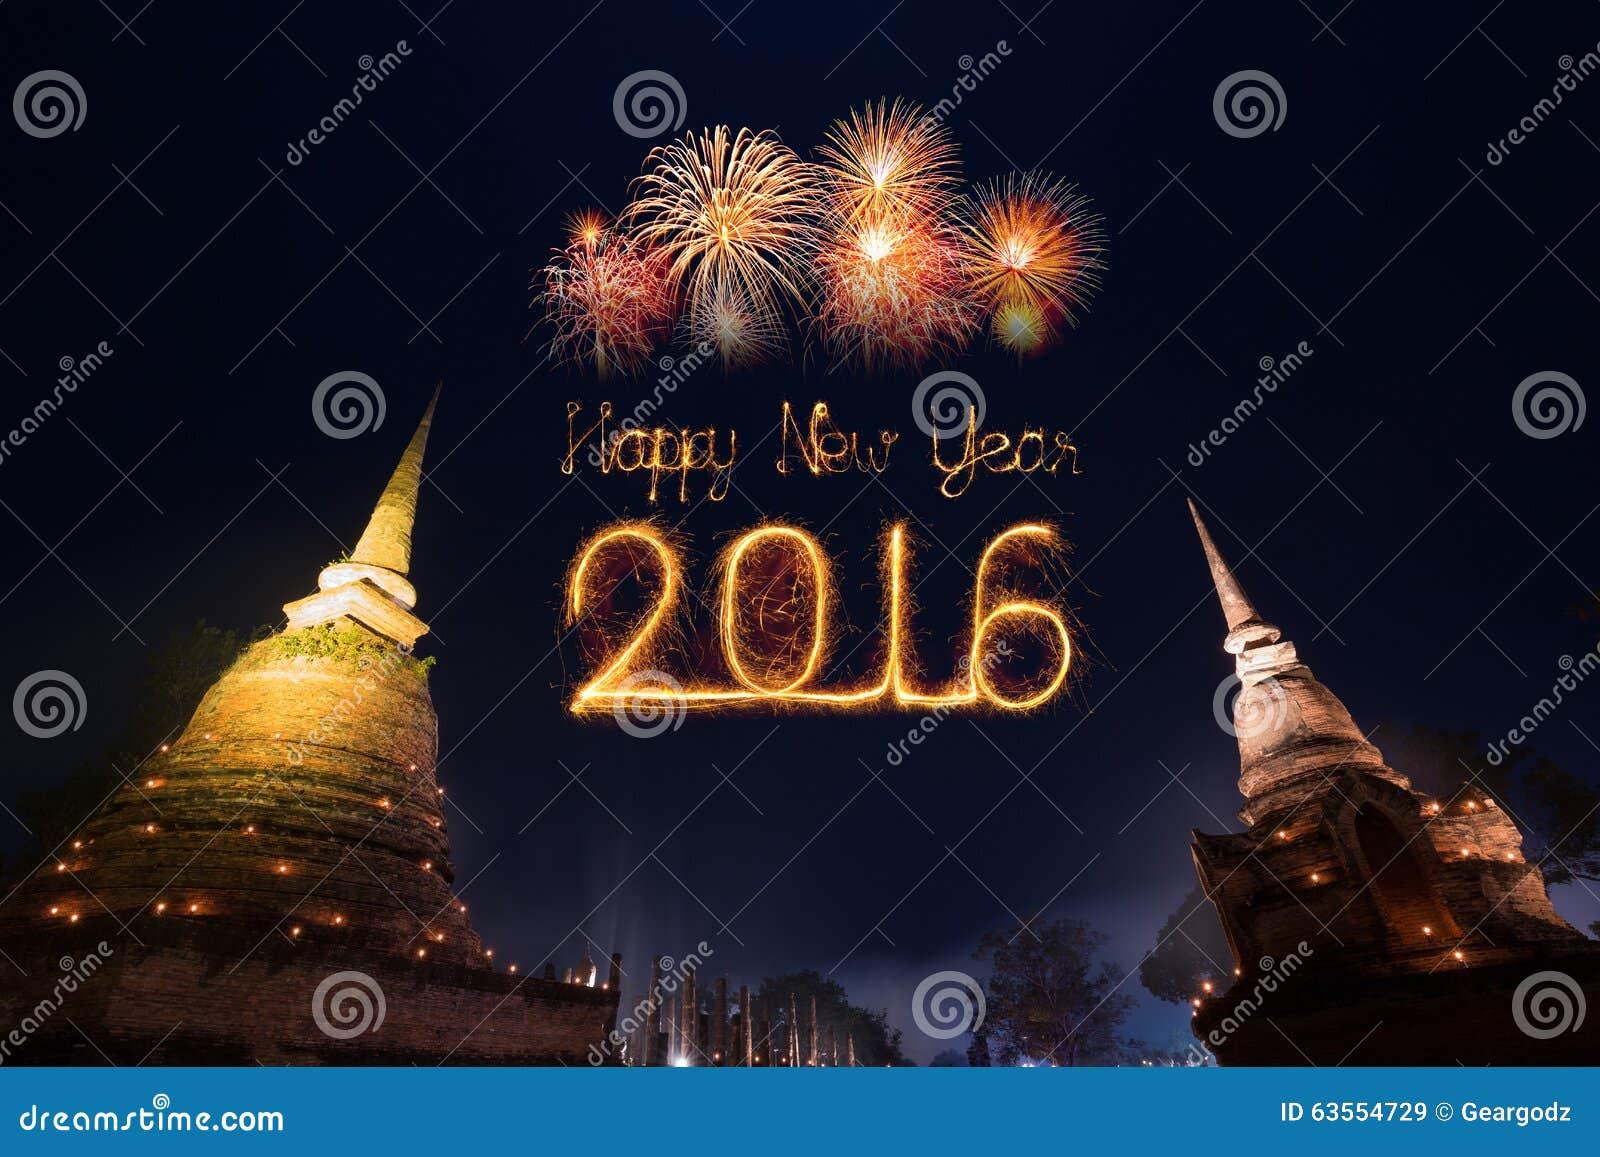 2016 happy new year fireworks celebrating over sukhothai histori